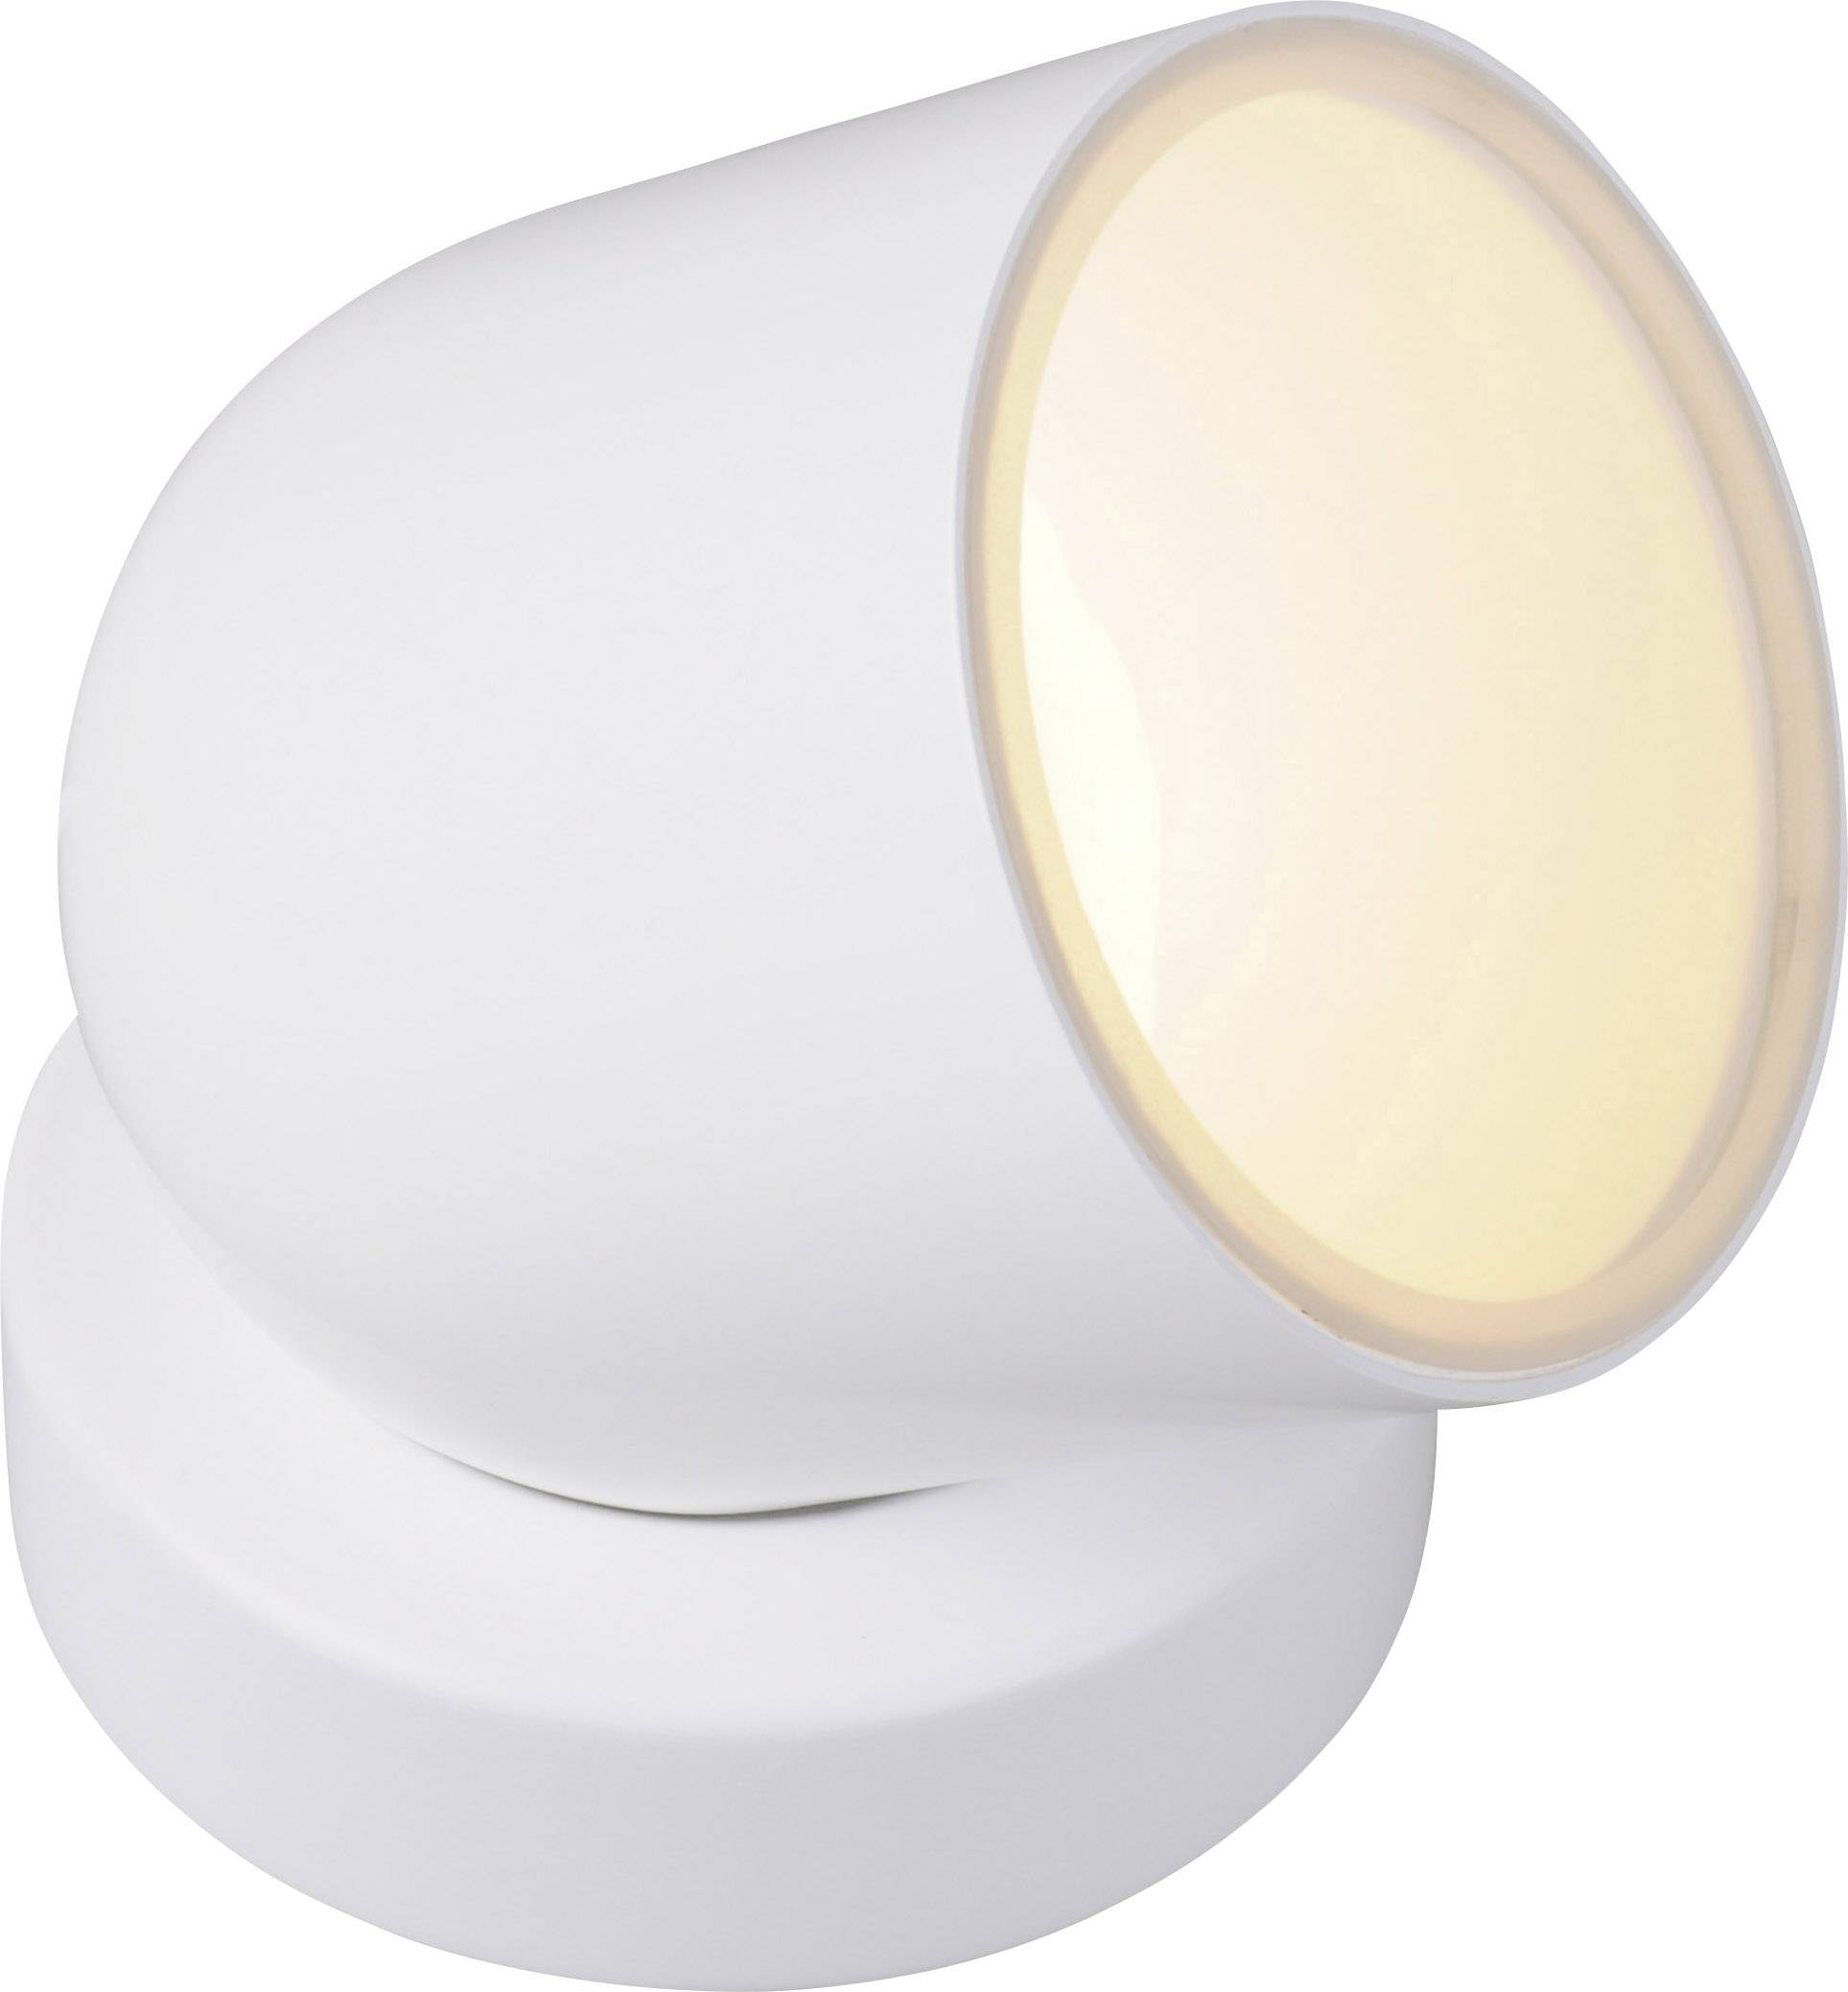 Leuchtendirekt Blüte 86131 18 Outdoor Decorative Lighting